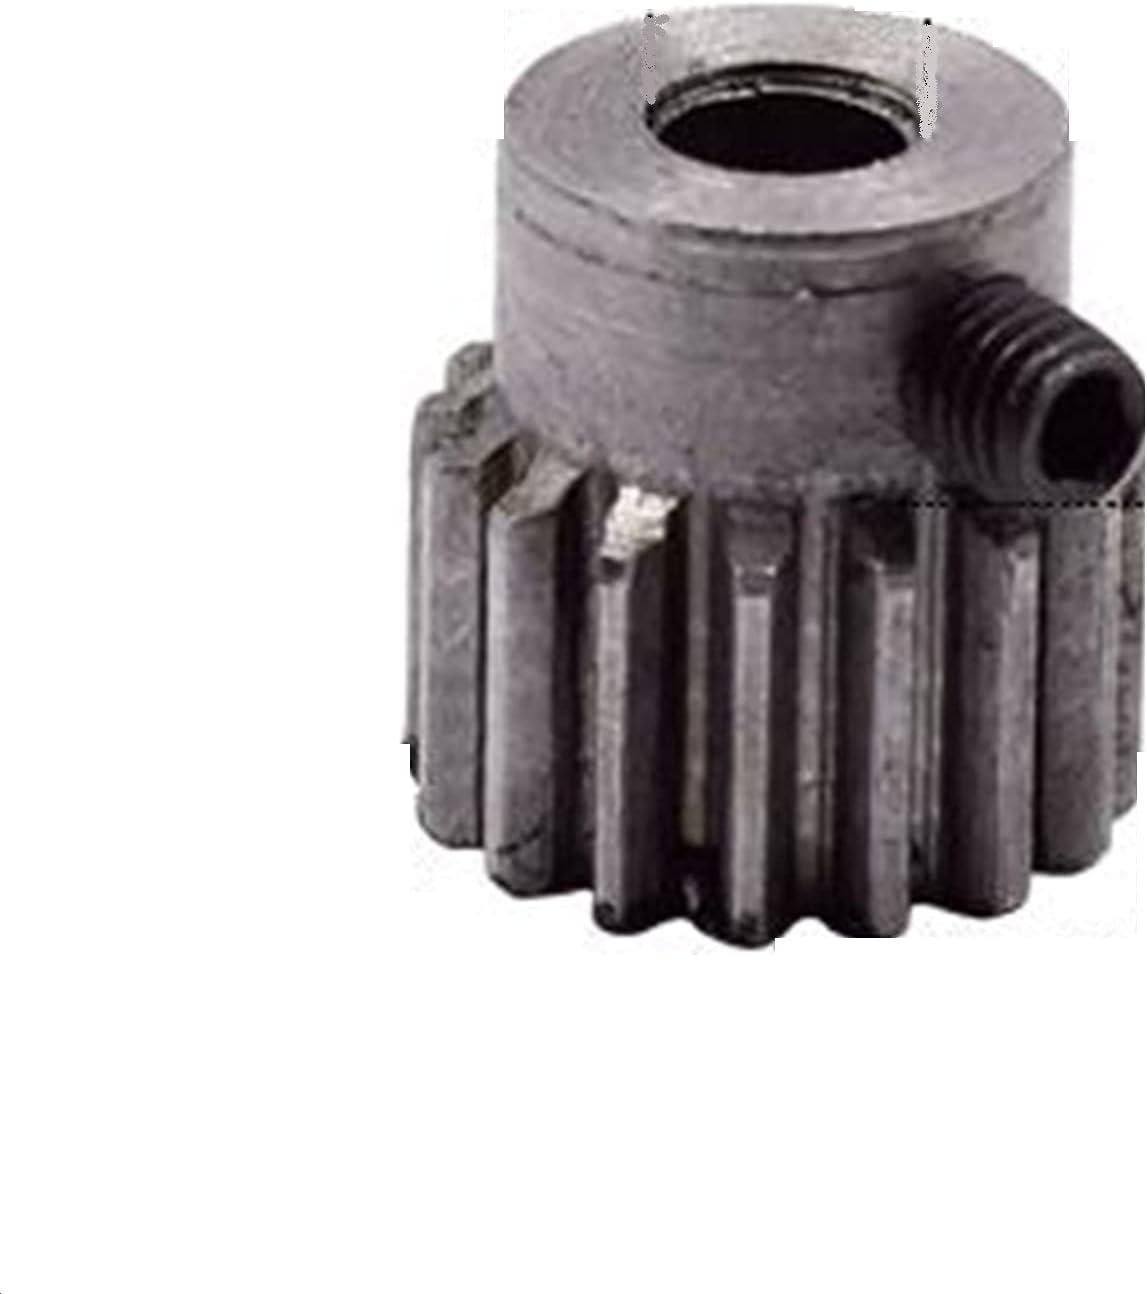 YINGJUN 1pc 1 Modulus excellence 16 Max 84% OFF Teeth Steel Wheel Gear Carbon Top Motor